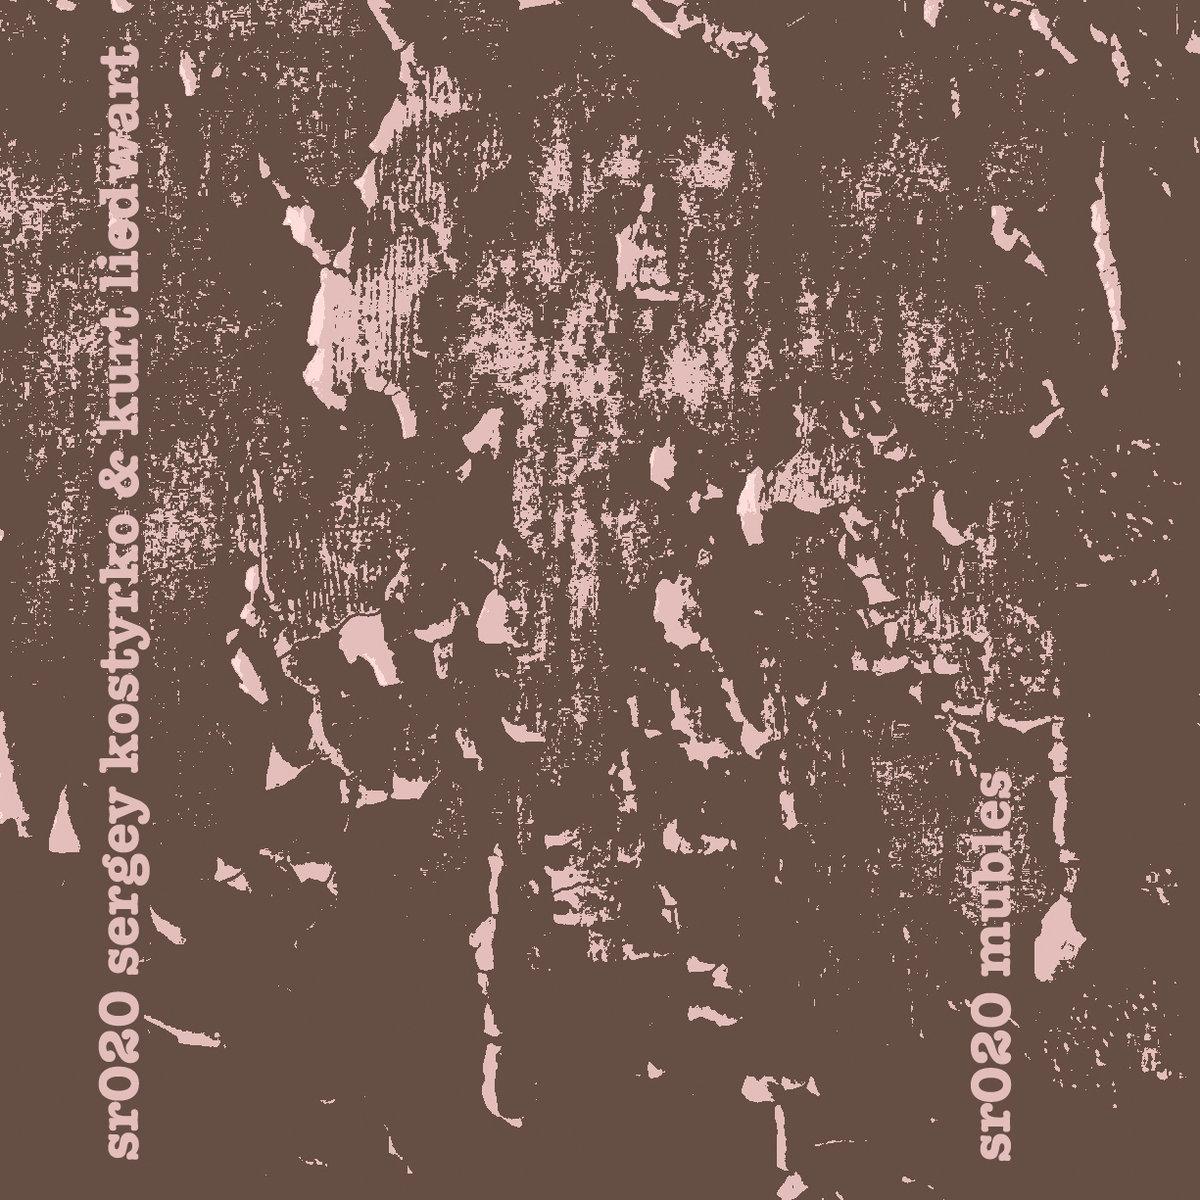 Sergey Kostyrko & Kurt Liedwart / Mubles - Split